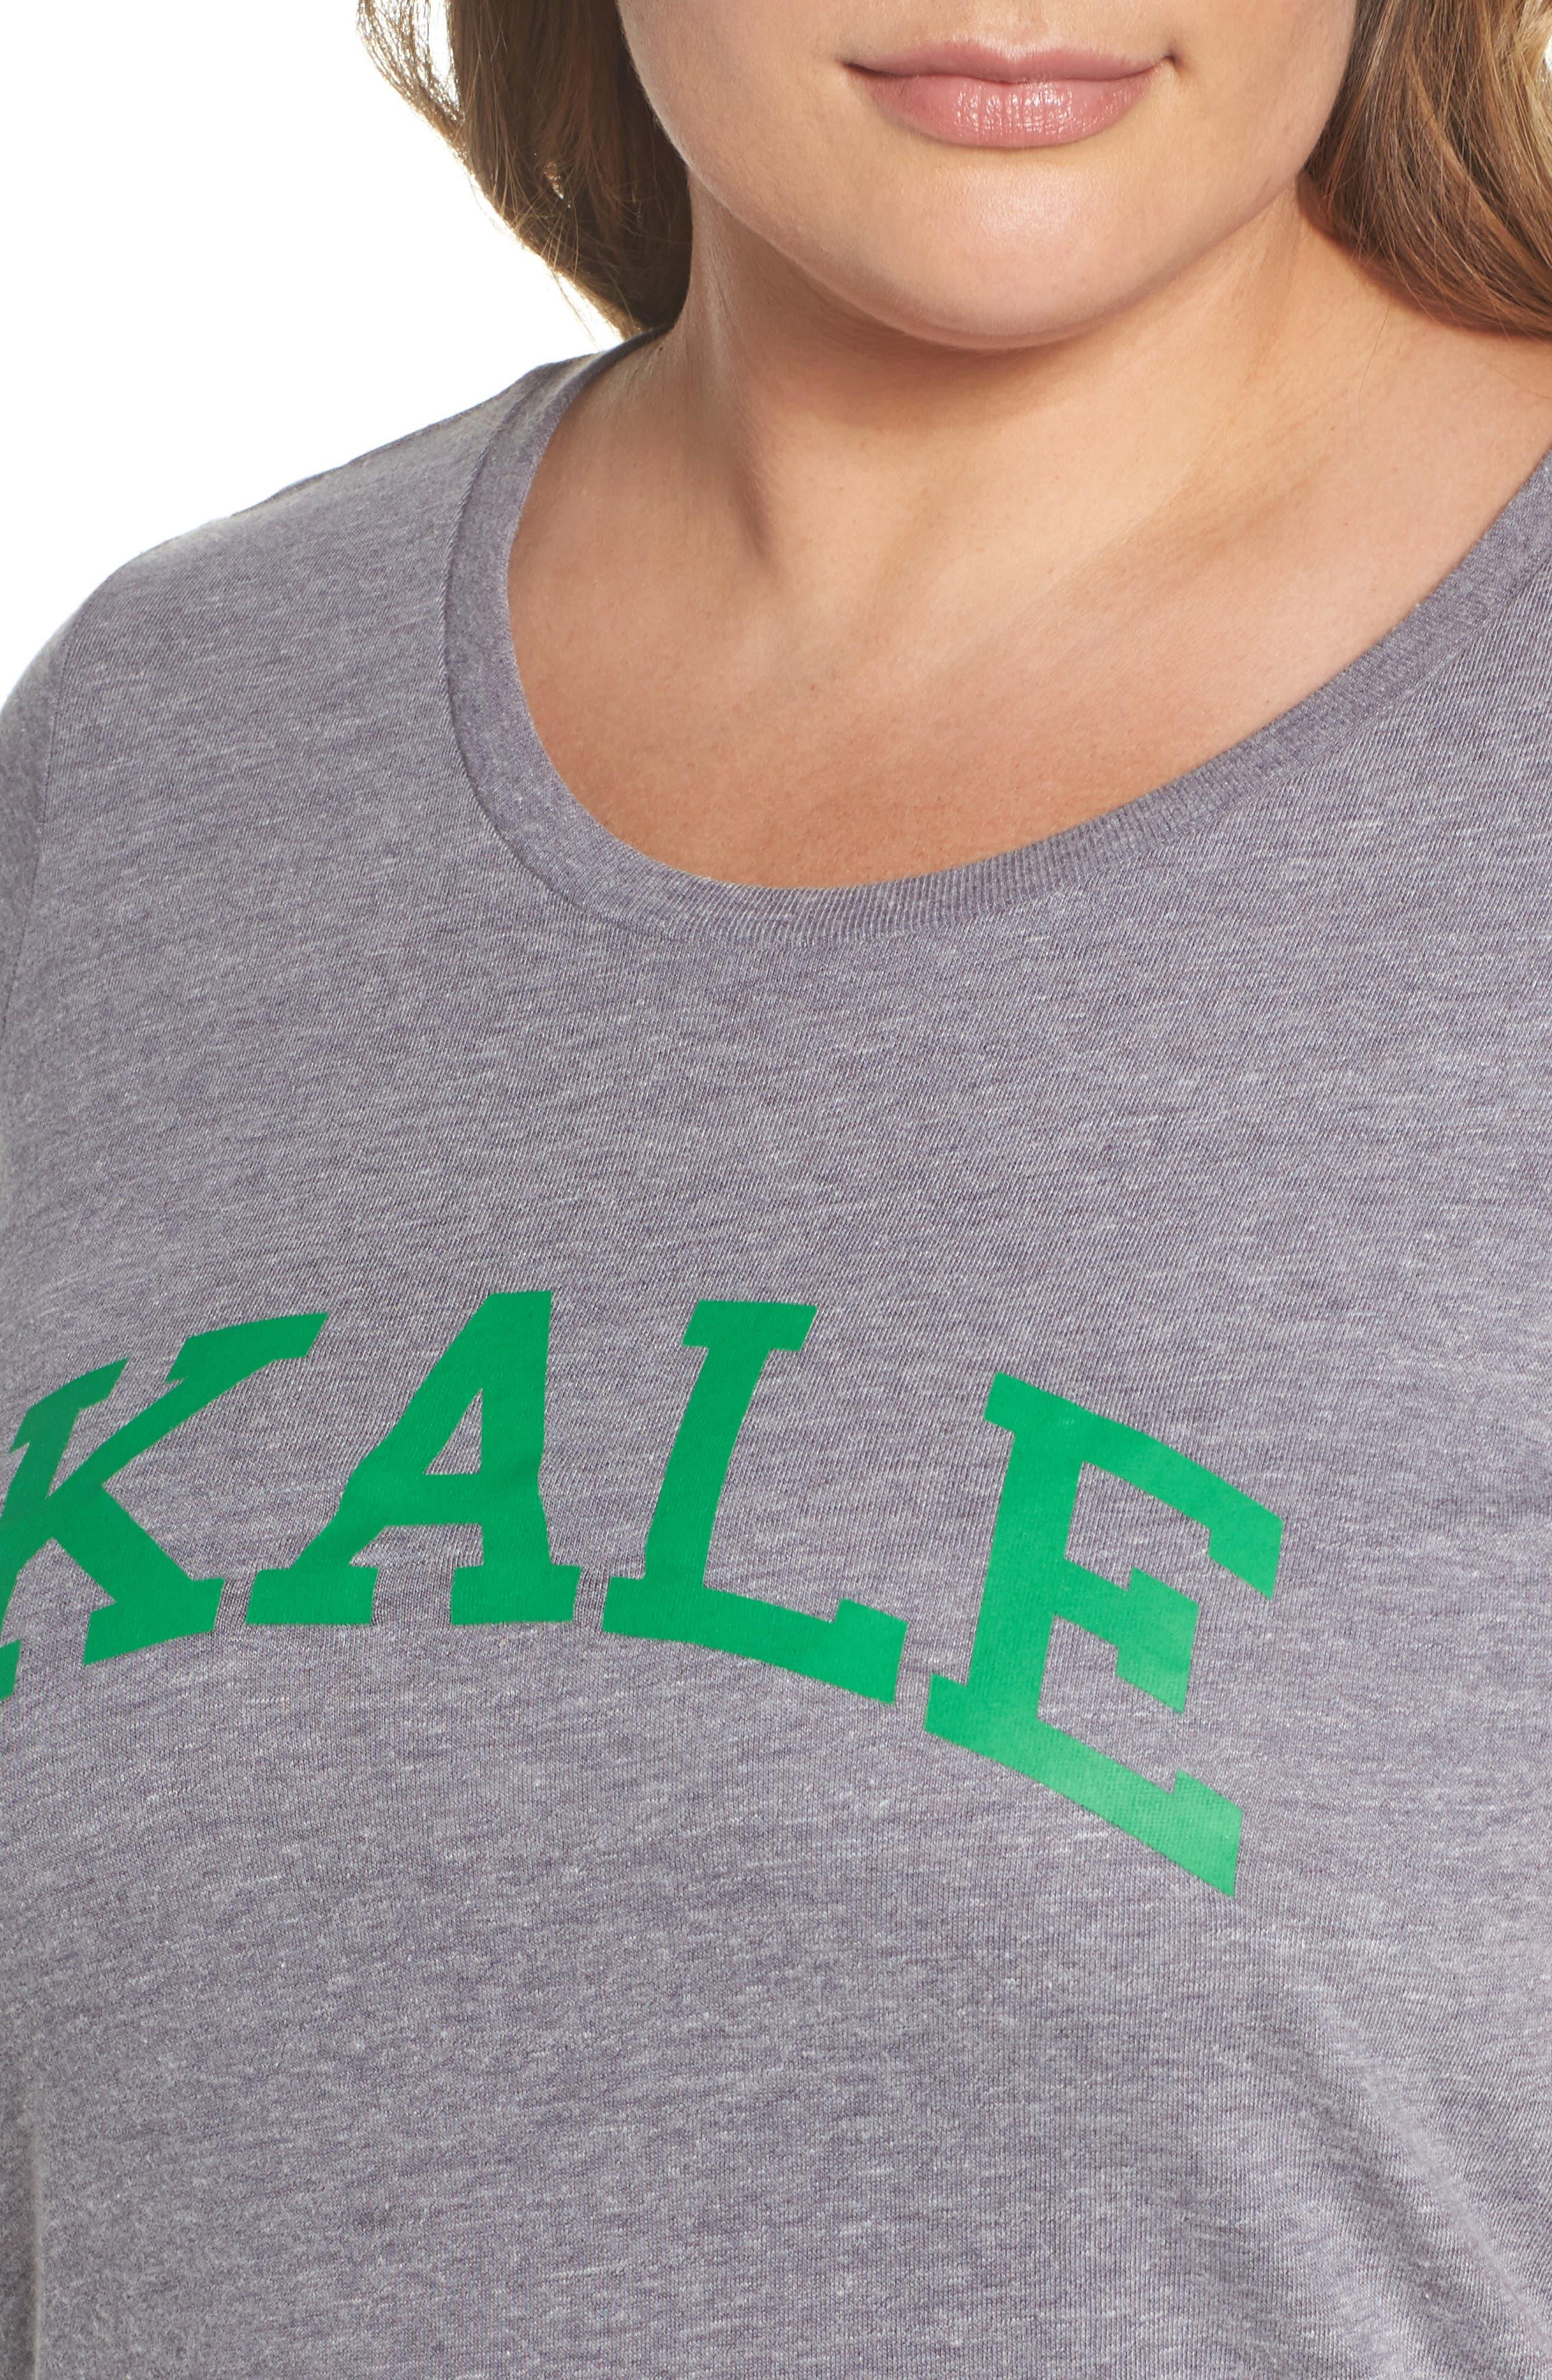 Kale Graphic Tee,                             Alternate thumbnail 4, color,                             050